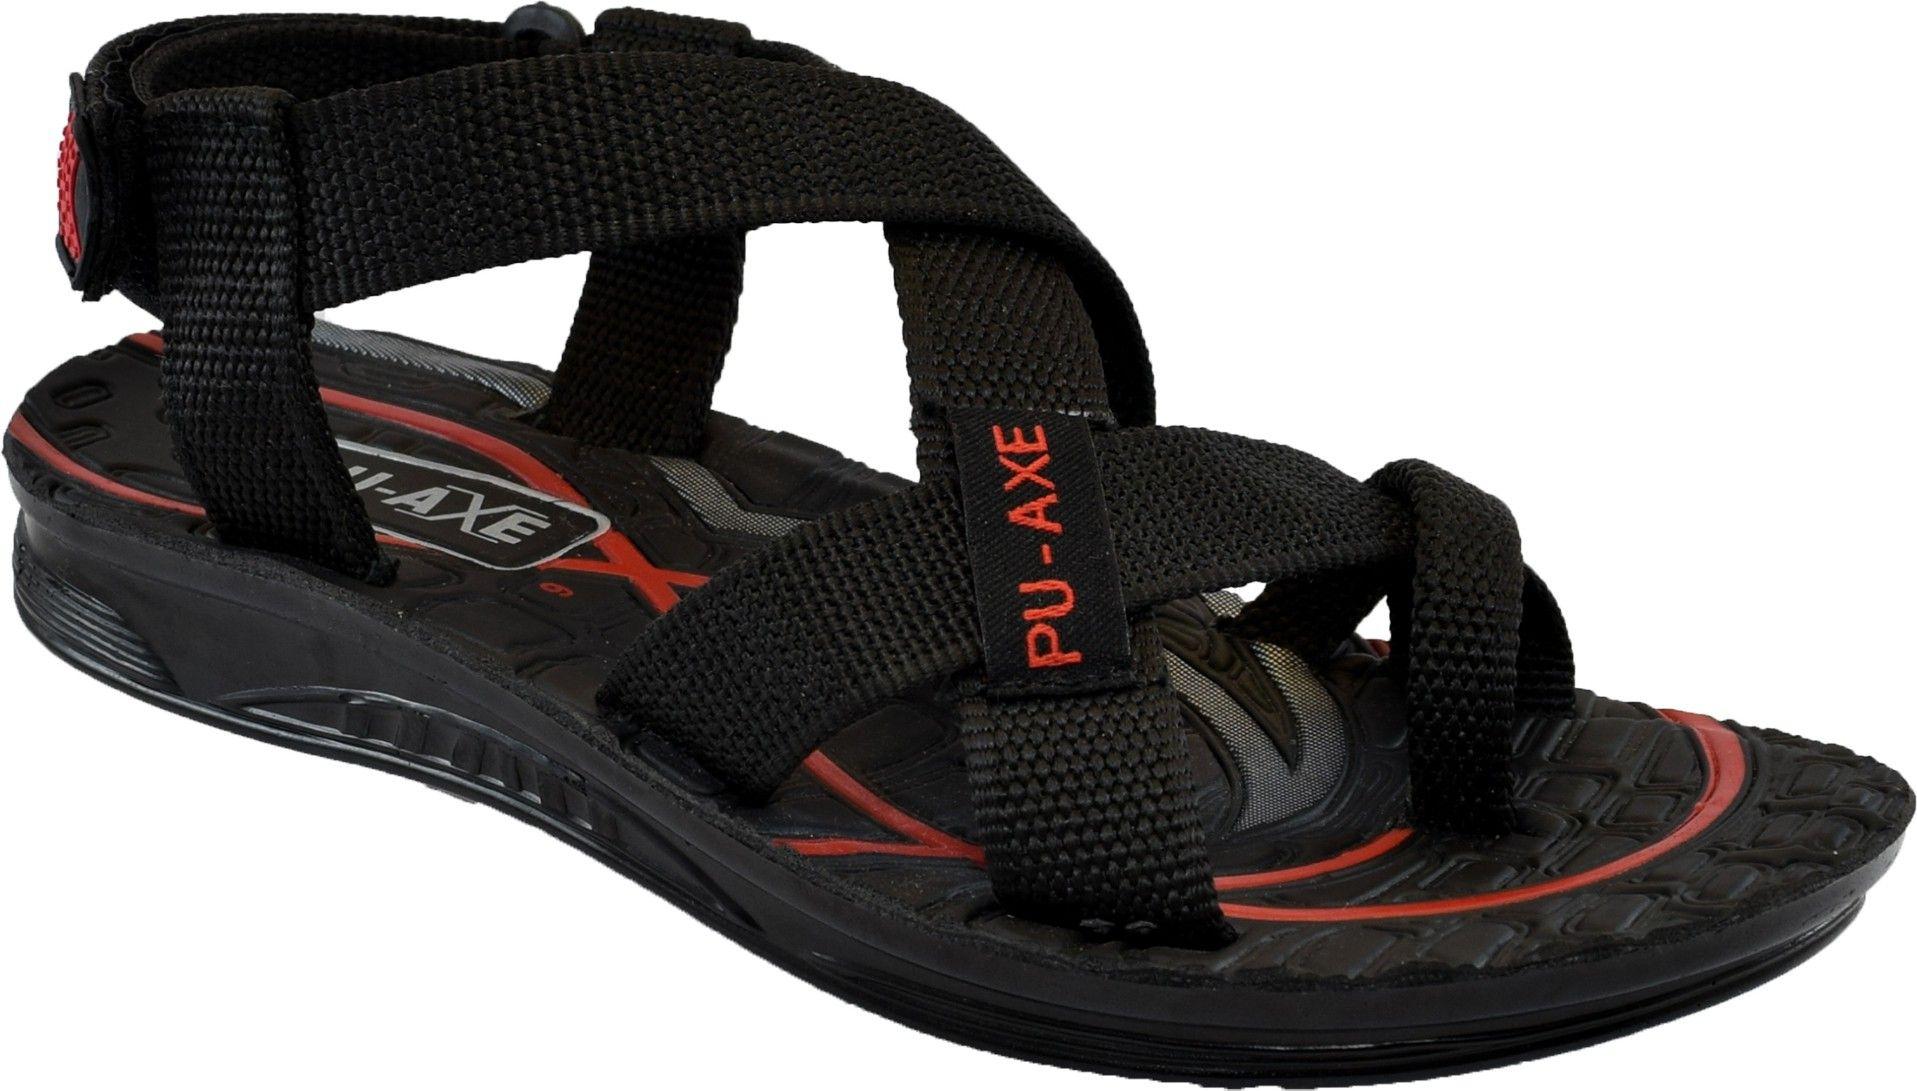 1fbf212598e7 PU-AXE Men Sandals - Buy Black Color PU-AXE Men Sandals Online at Best Price  - Shop Online for Footwears in India